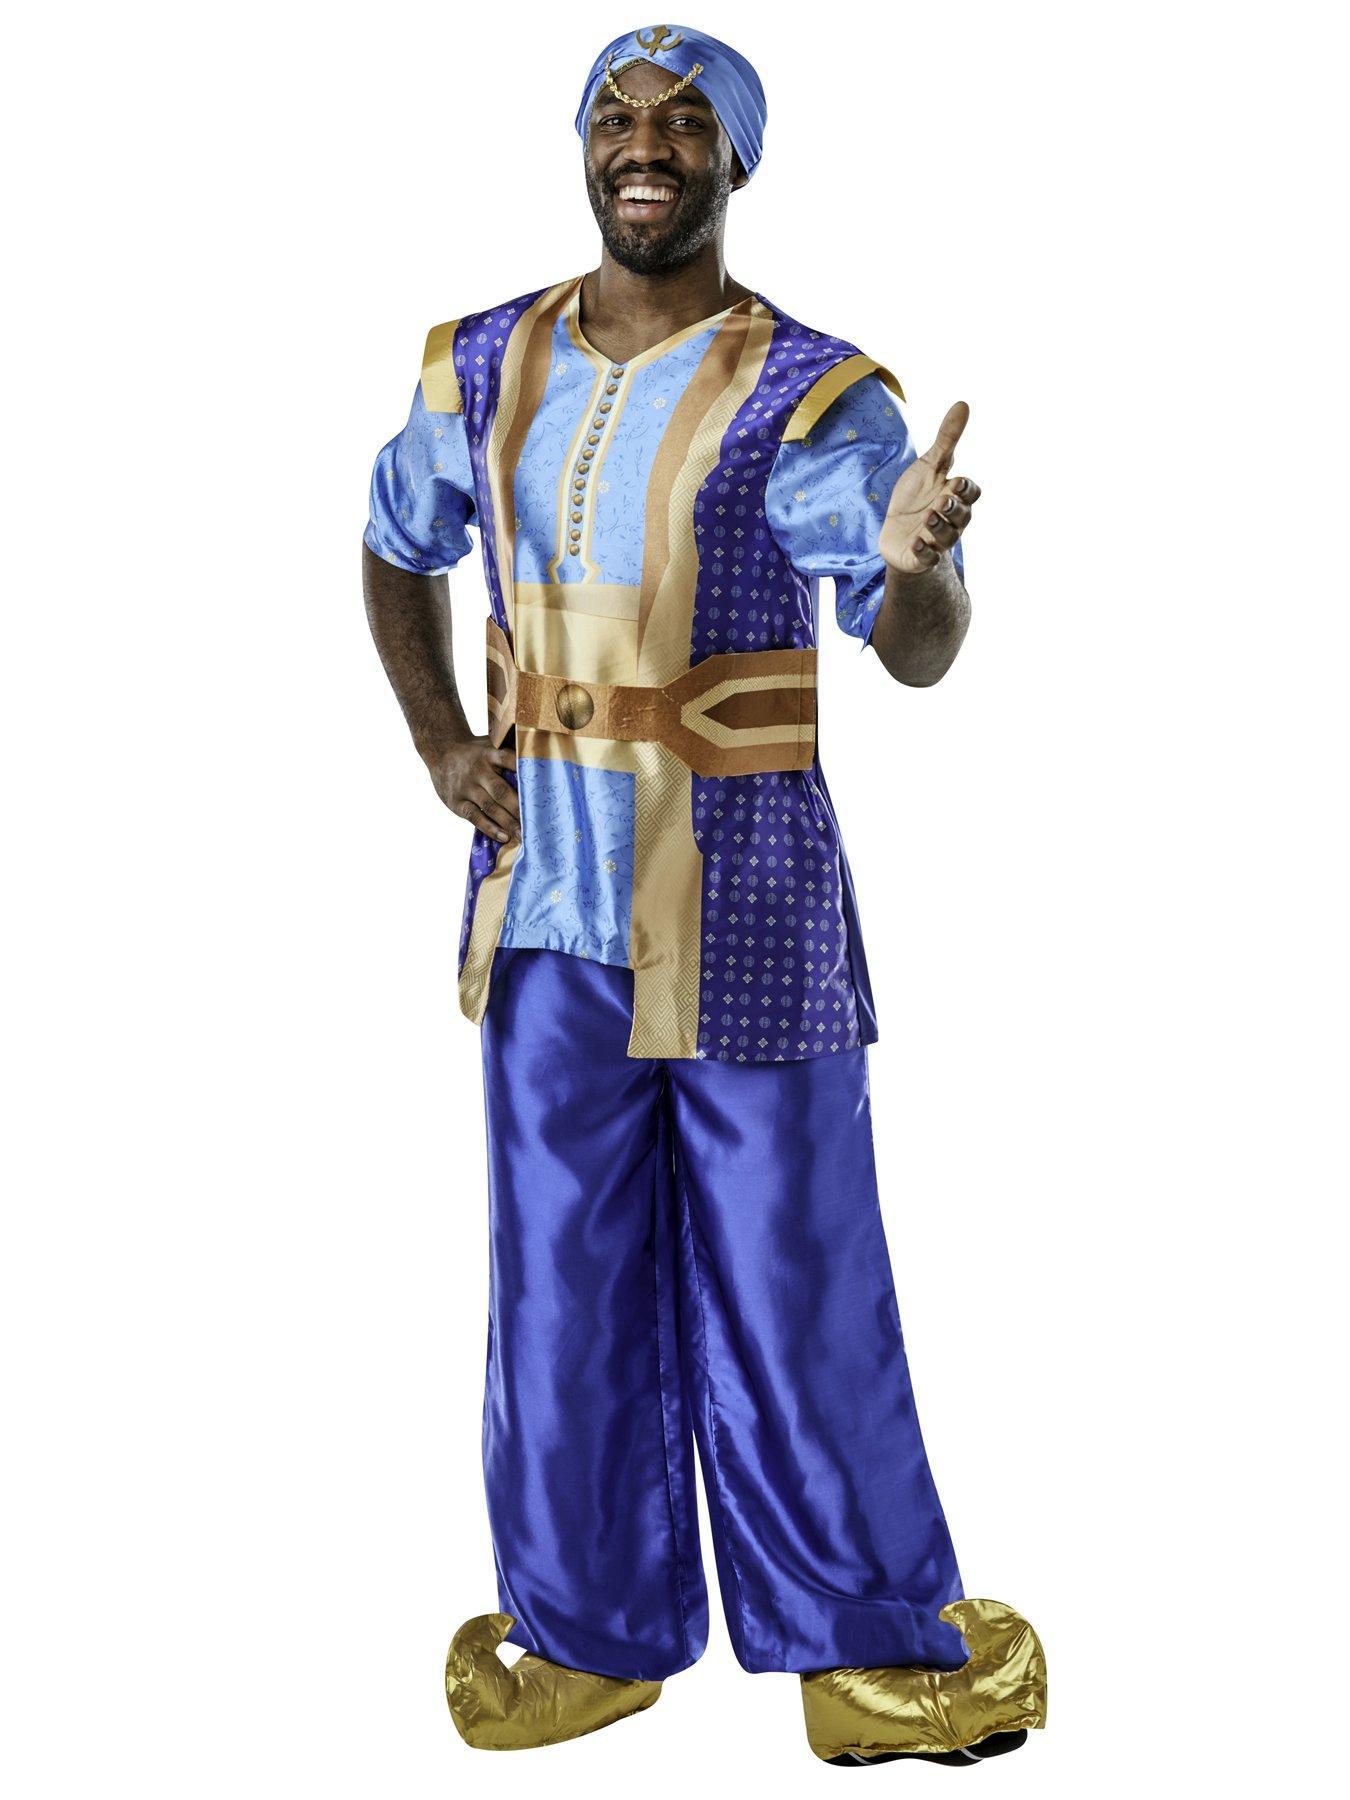 Adult Muscle Genie Costume 2 Sizes Fancy Dress Fairy Tale Party